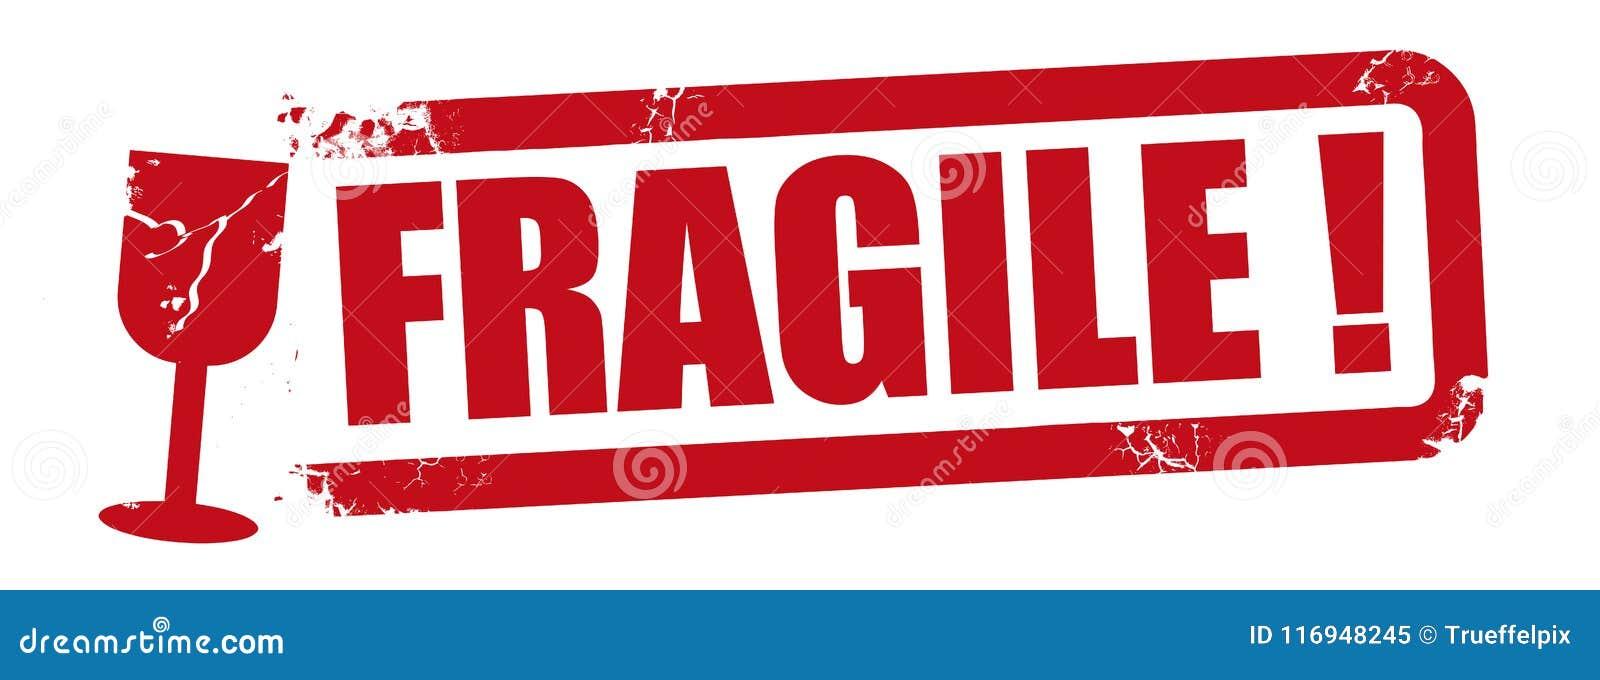 Fragile Stamp Red Vector Illustration Stock Vector ...